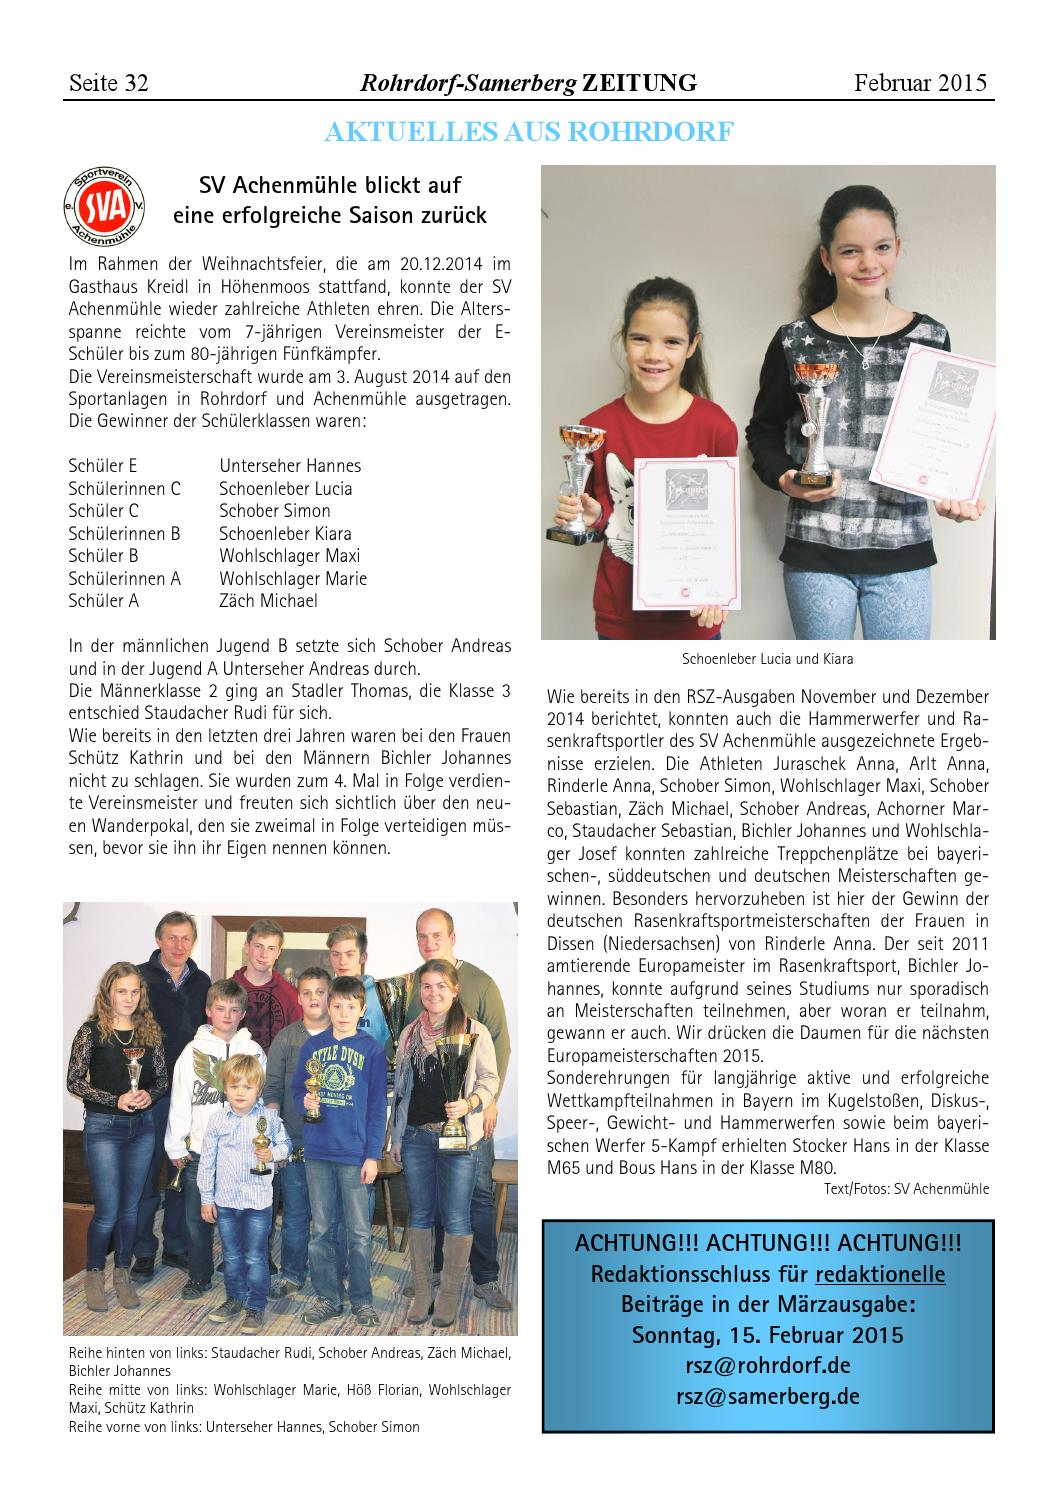 RSZ Rohrdorf-Samerberg ZEITUNG Ausgabe Februar 2015 by Uwe ...